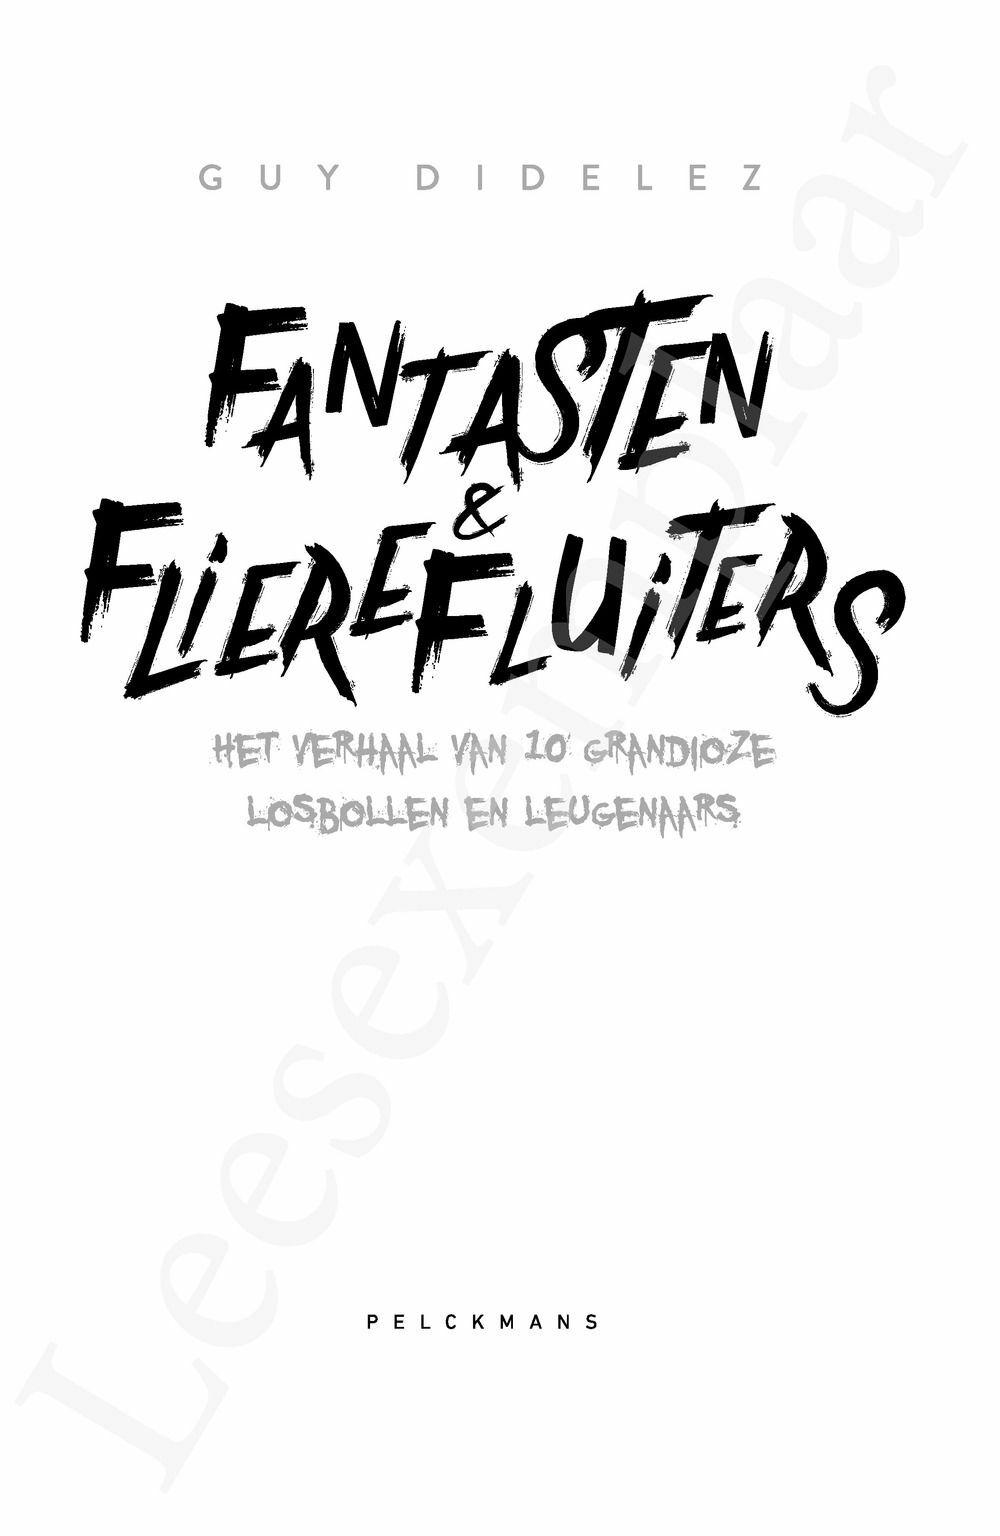 Preview: Fantasten & flierefluiters